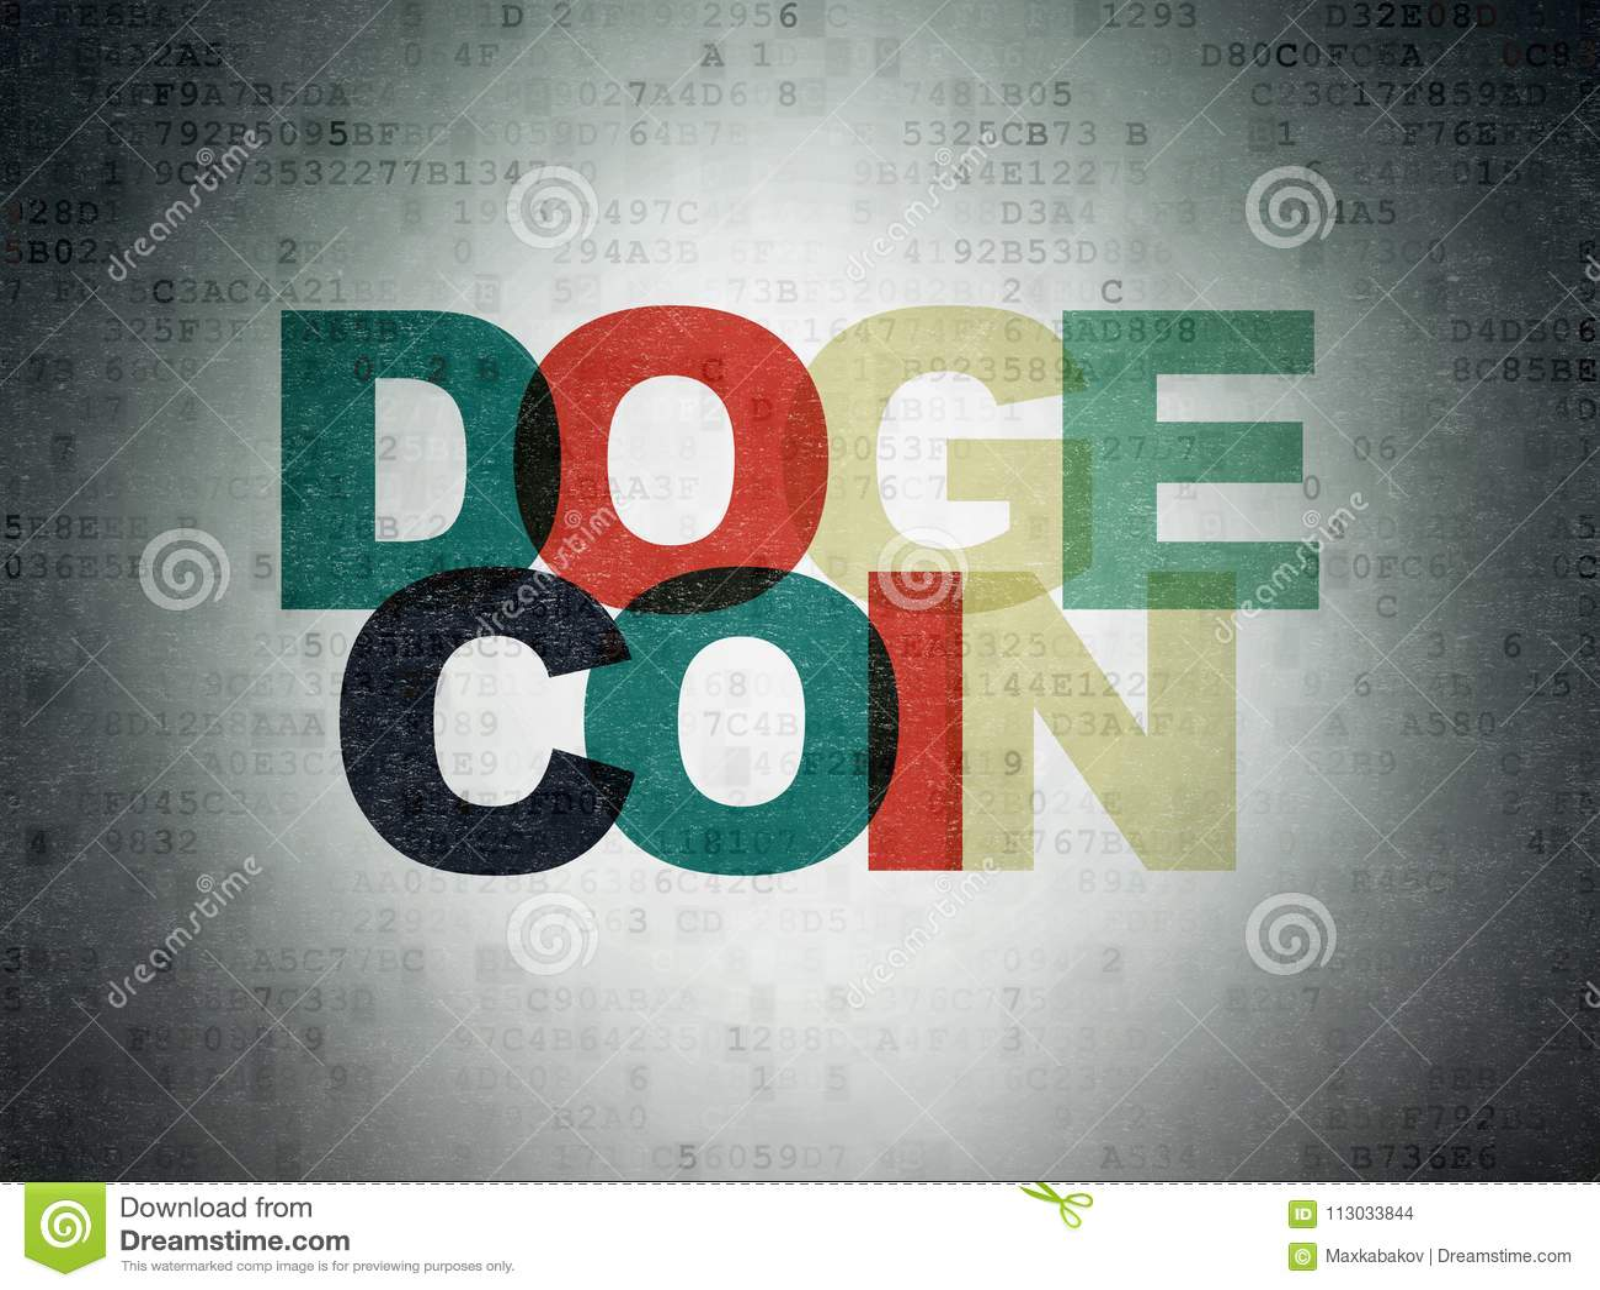 Concepto de Blockchain: Dogecoin en fondo del papel de datos de Digitaces